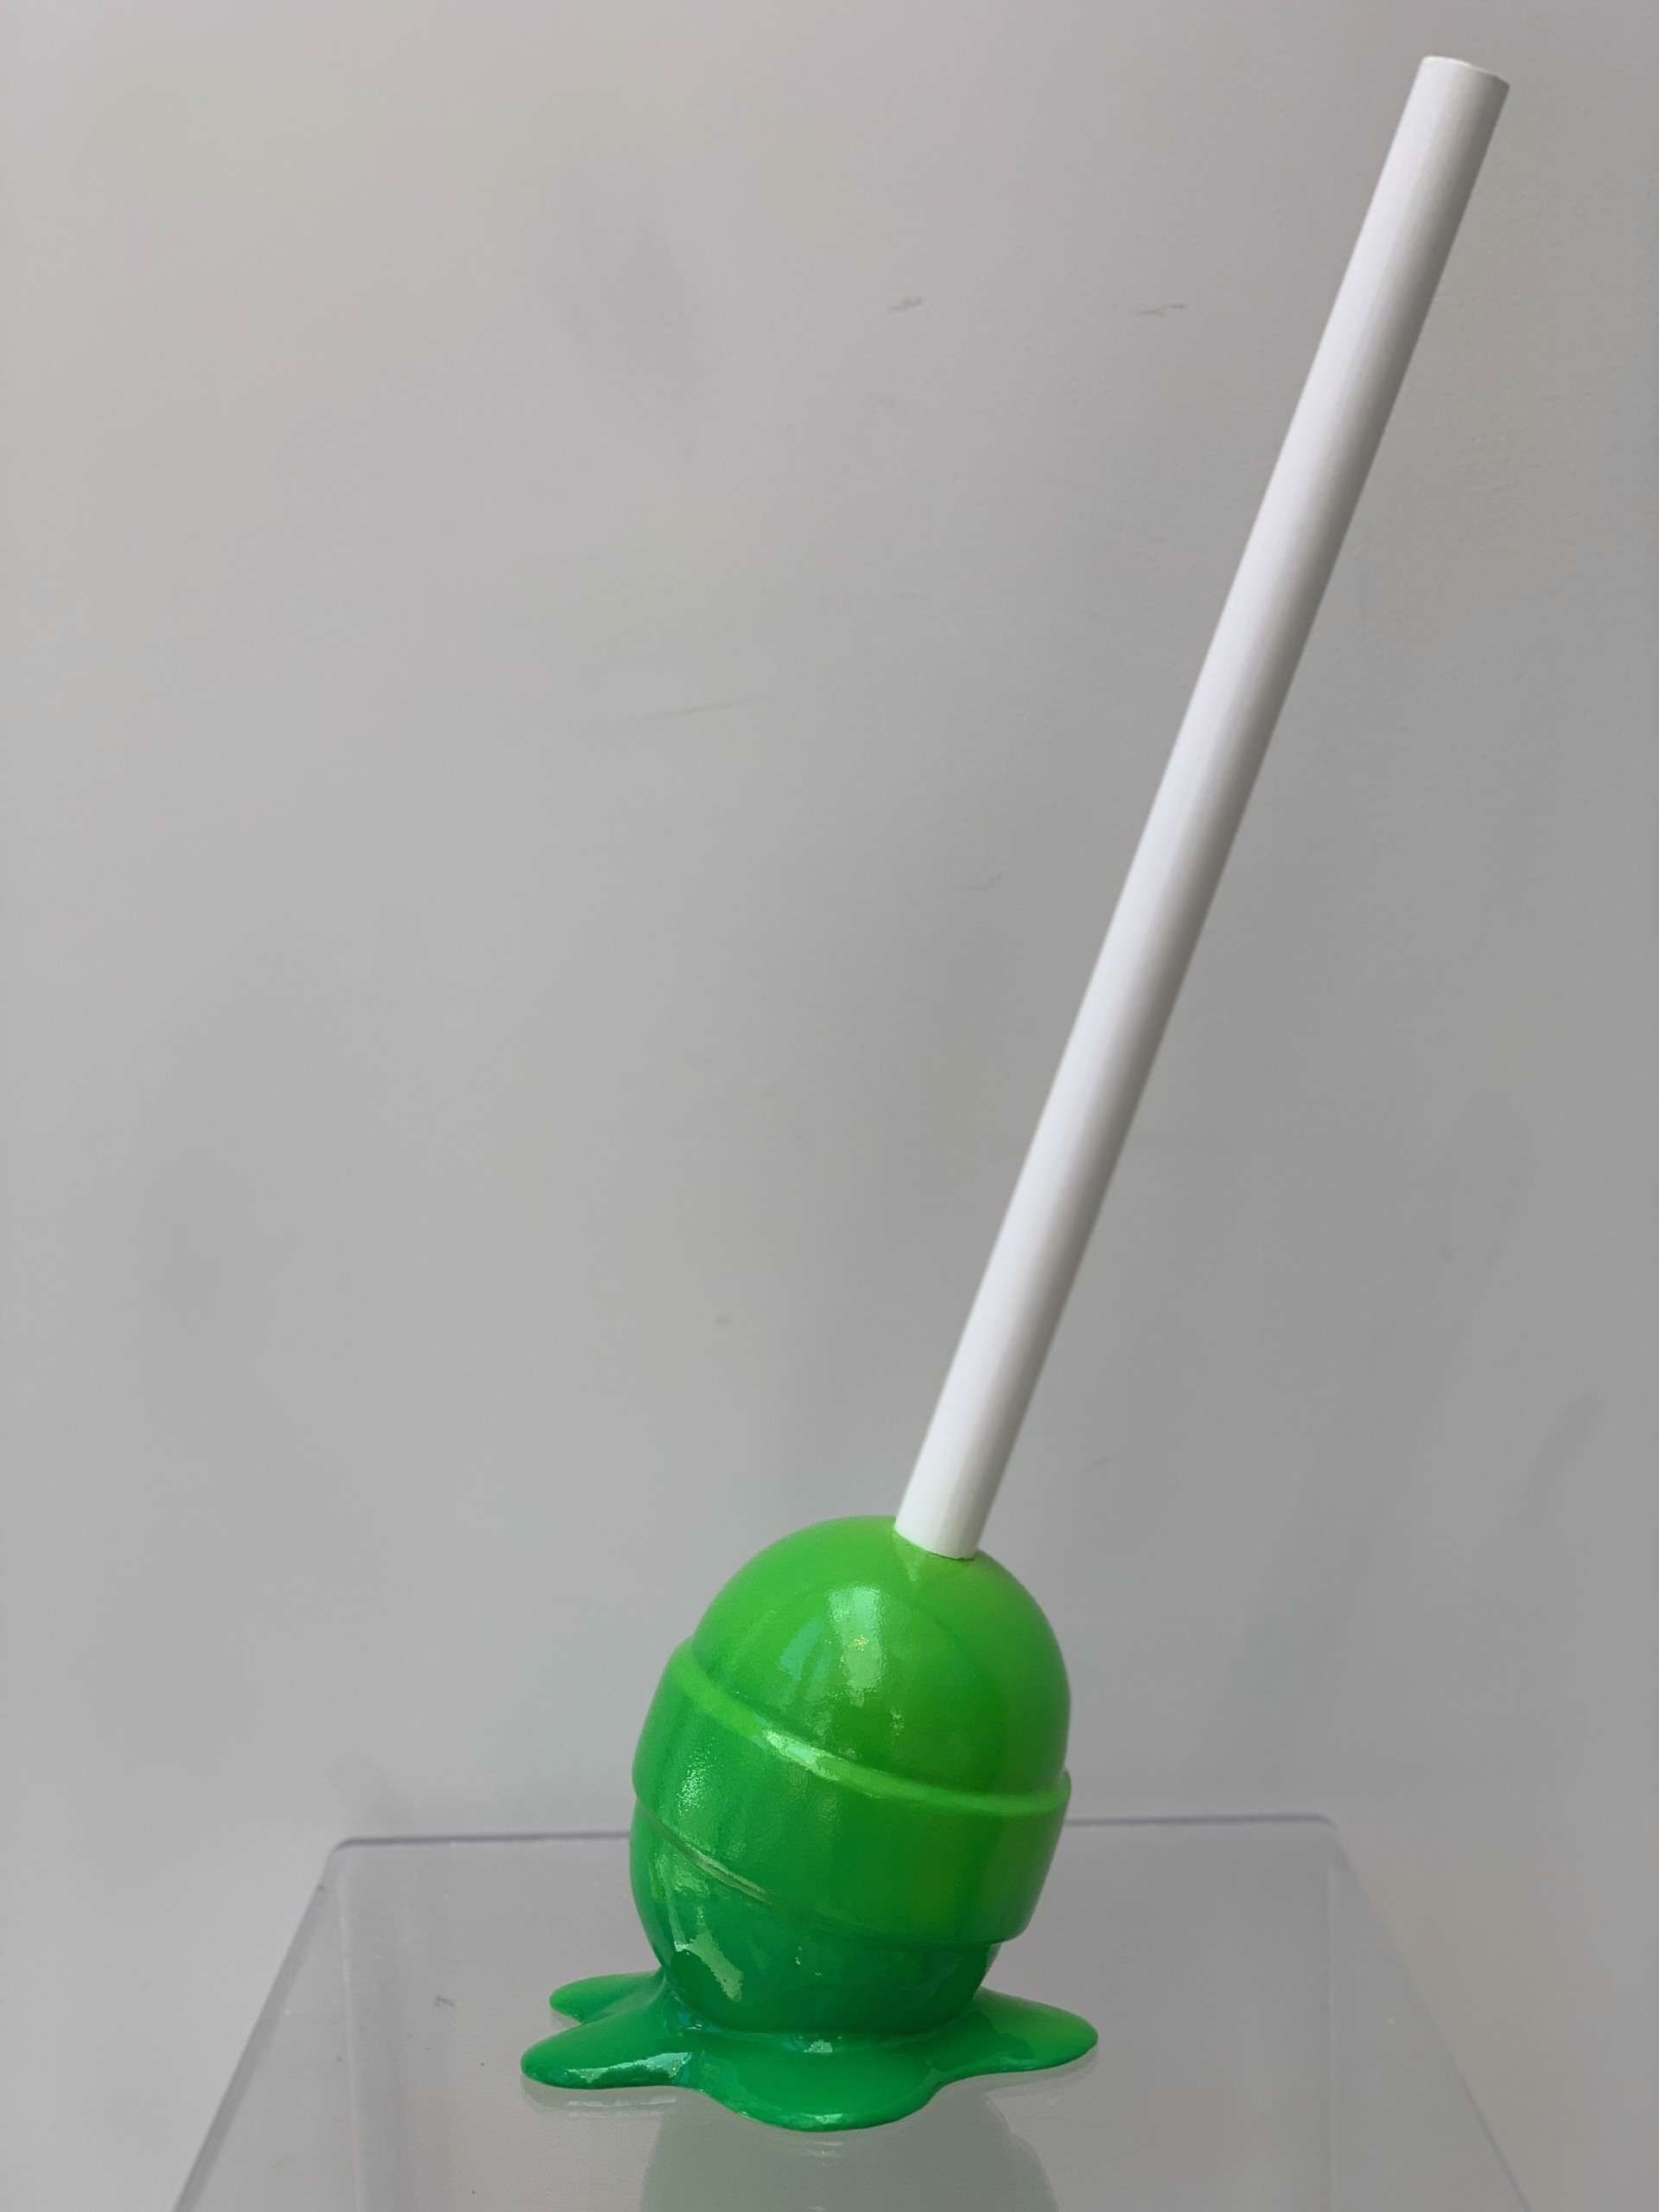 The Sweet life small Green lollipop by Elena Bulatova